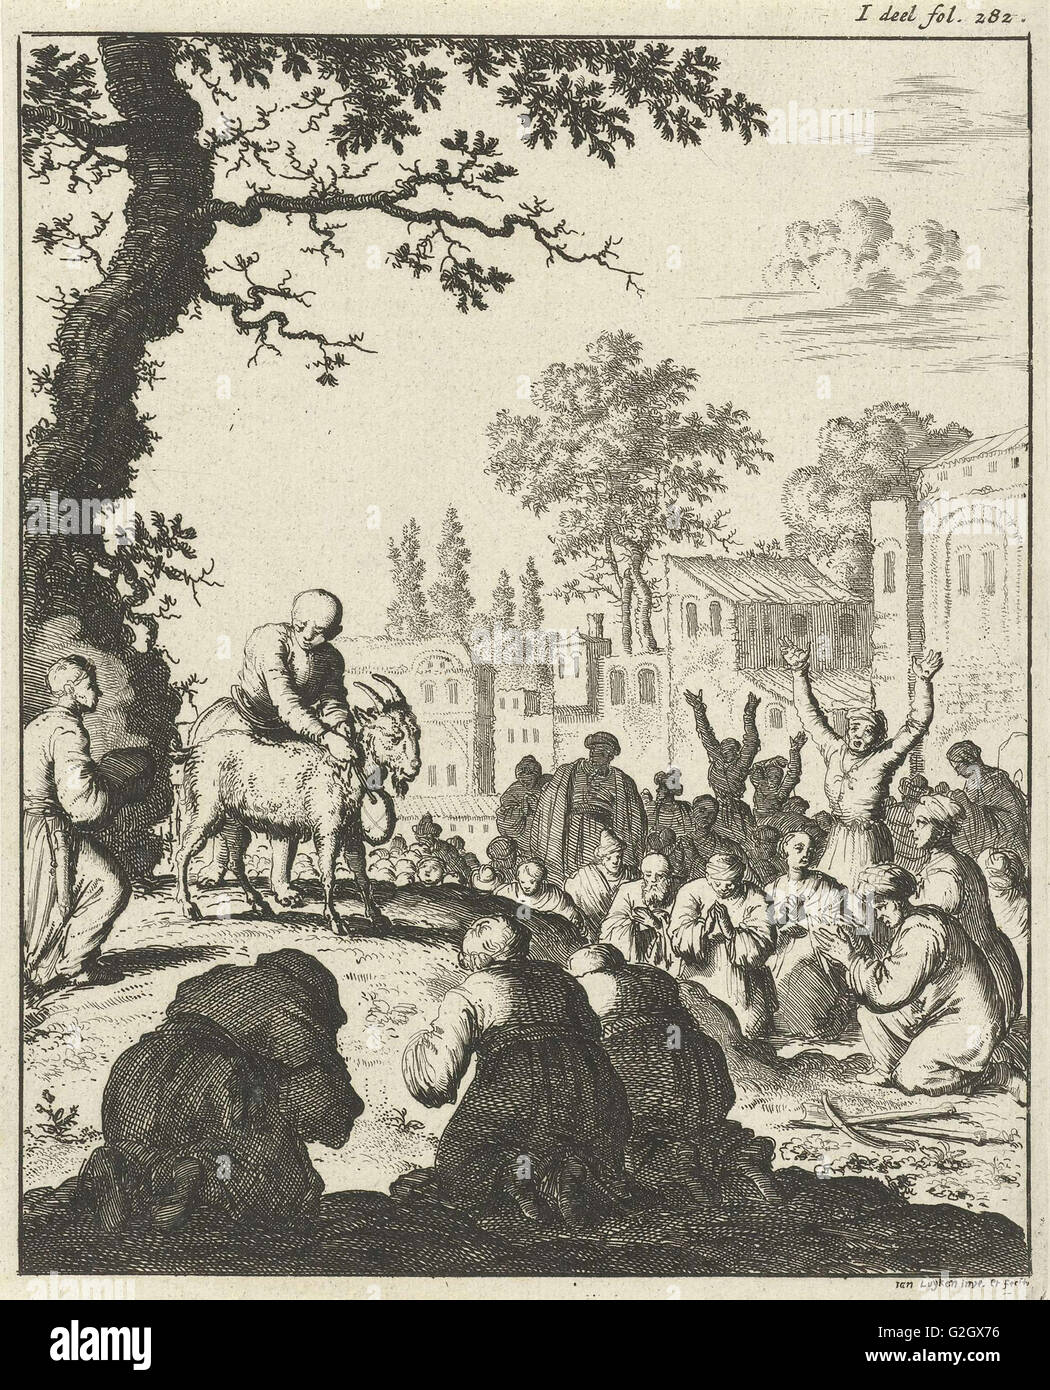 Worship of the white goat, print maker: Jan Luyken, weduwe Joannes van Someren, 1682 - Stock Image